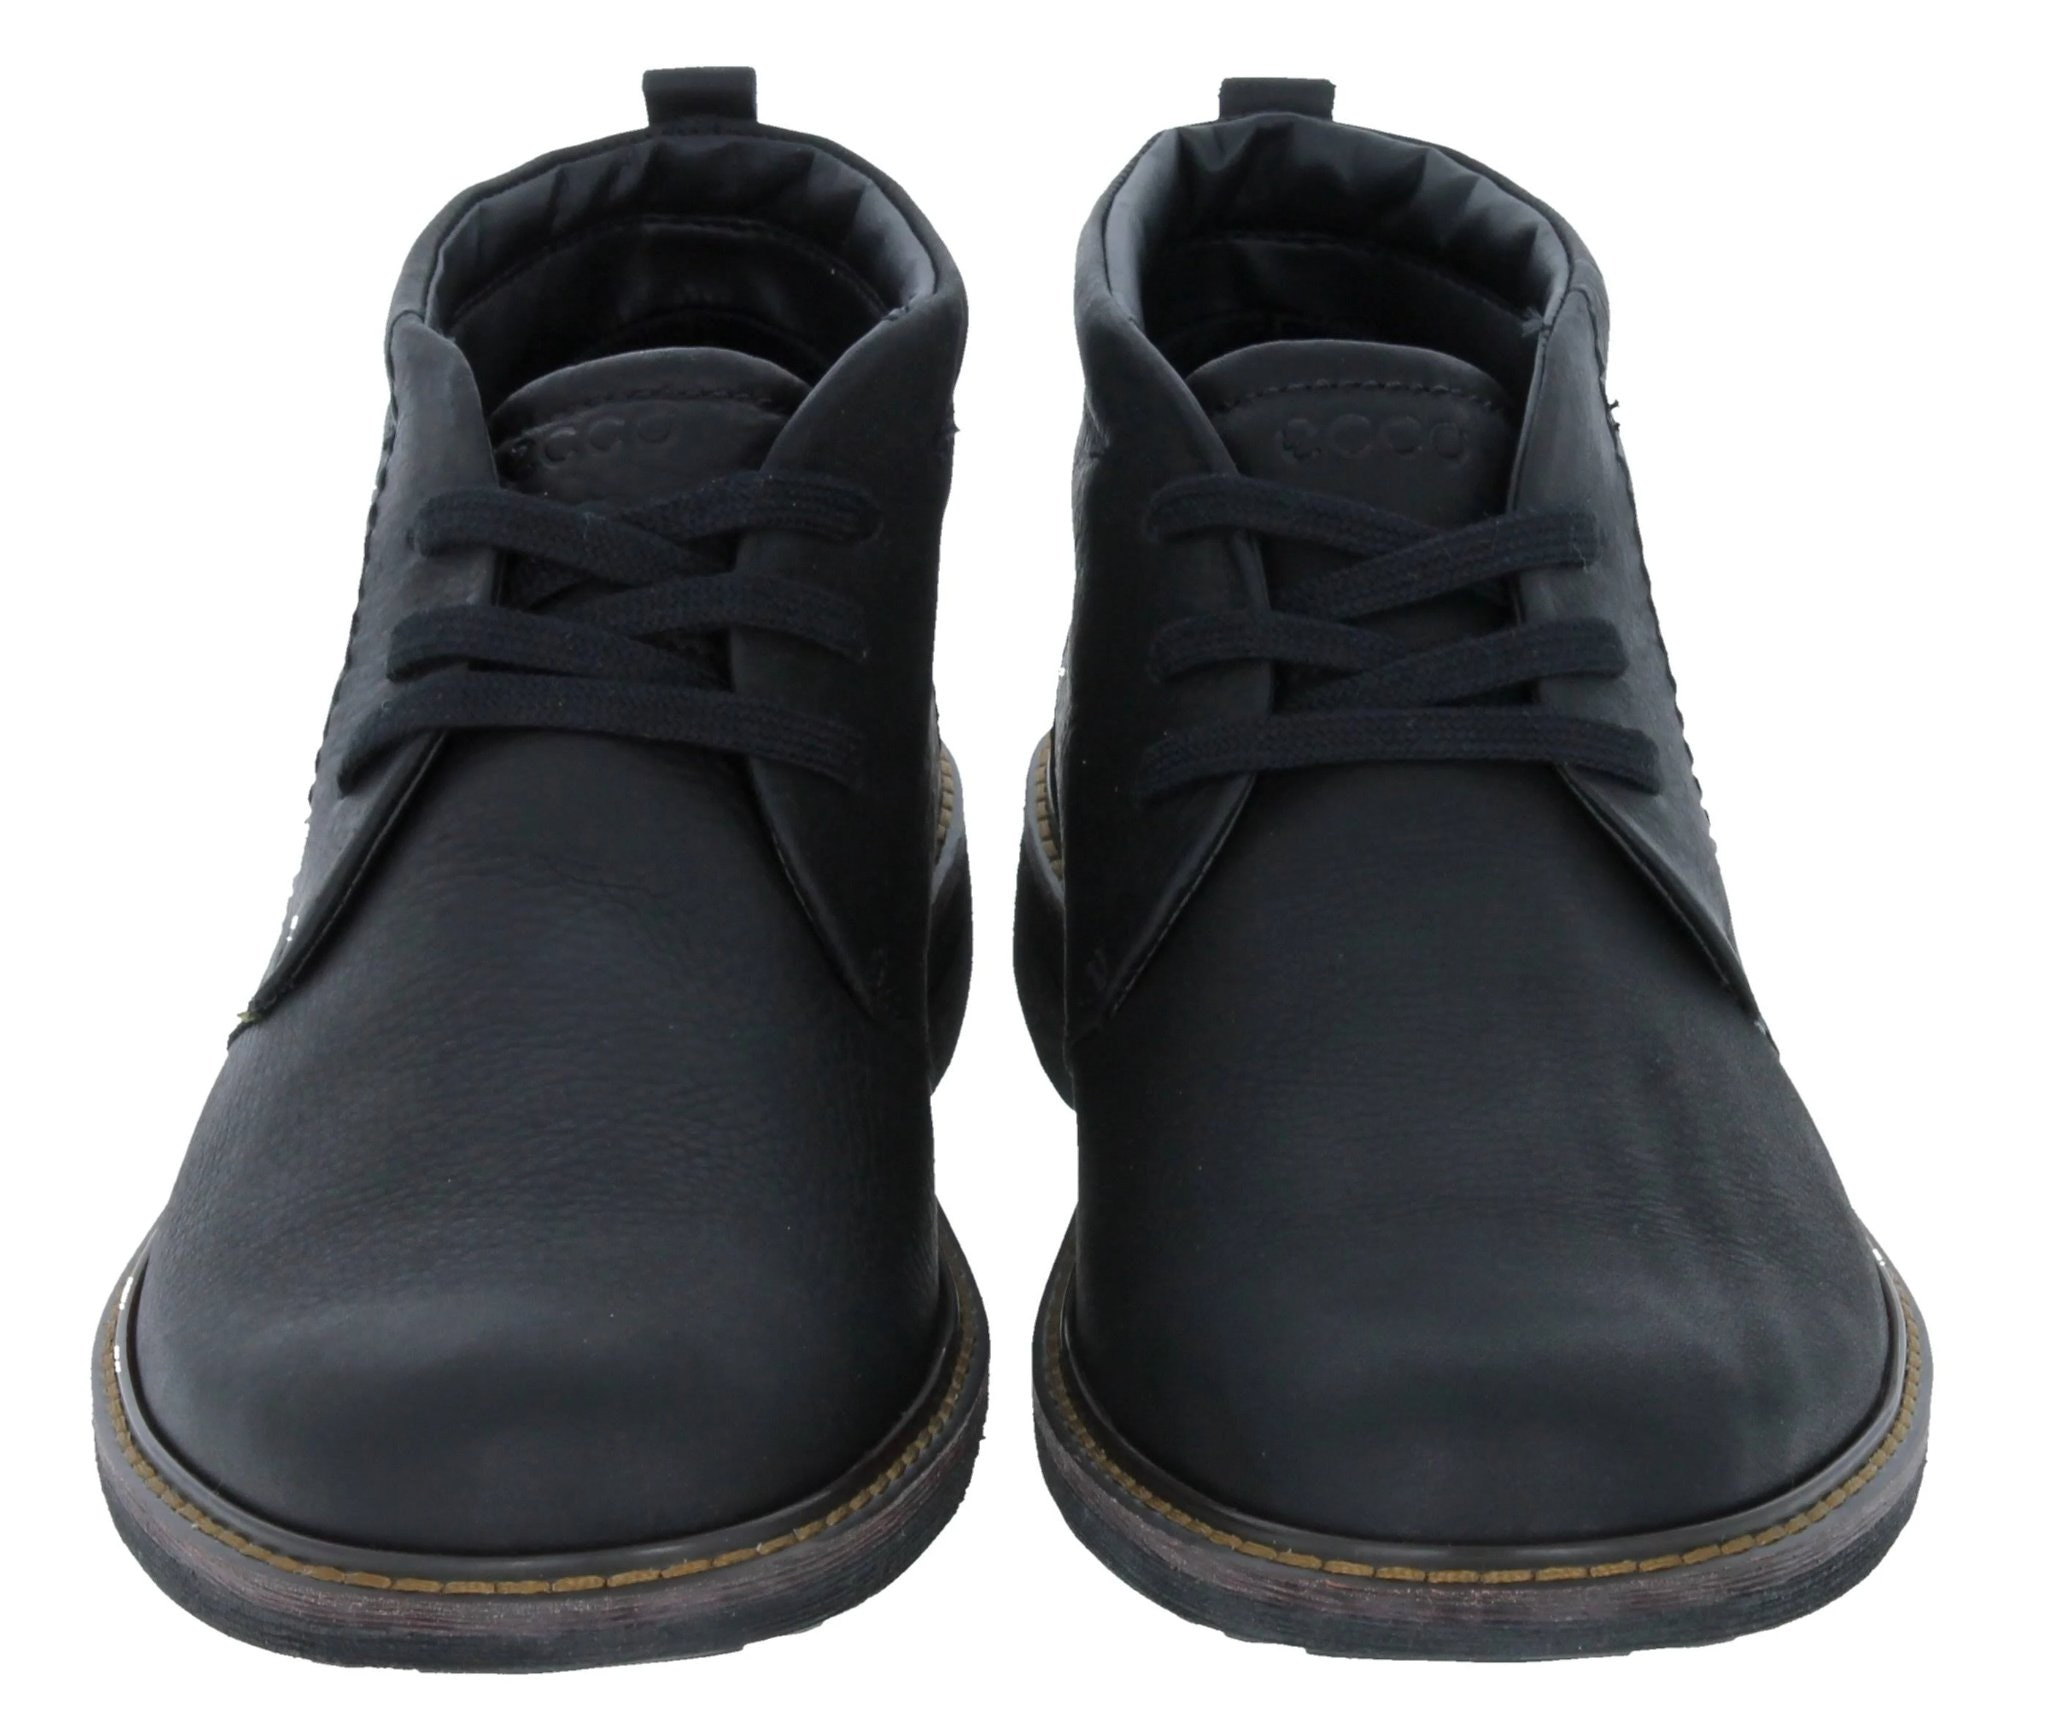 Ecco Men's Turn Gore-Tex Tie Chukka Boot